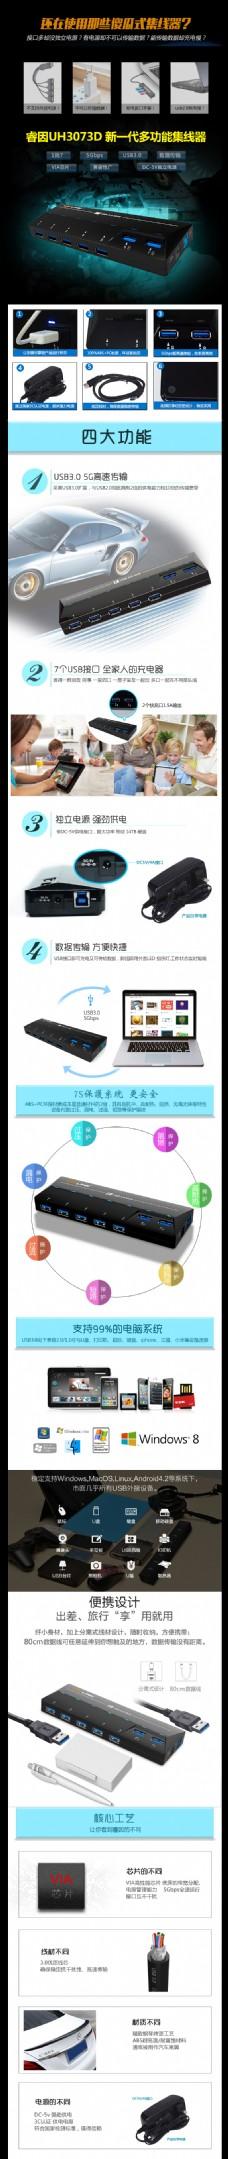 3c数码网络产品高清详情页 说明模板